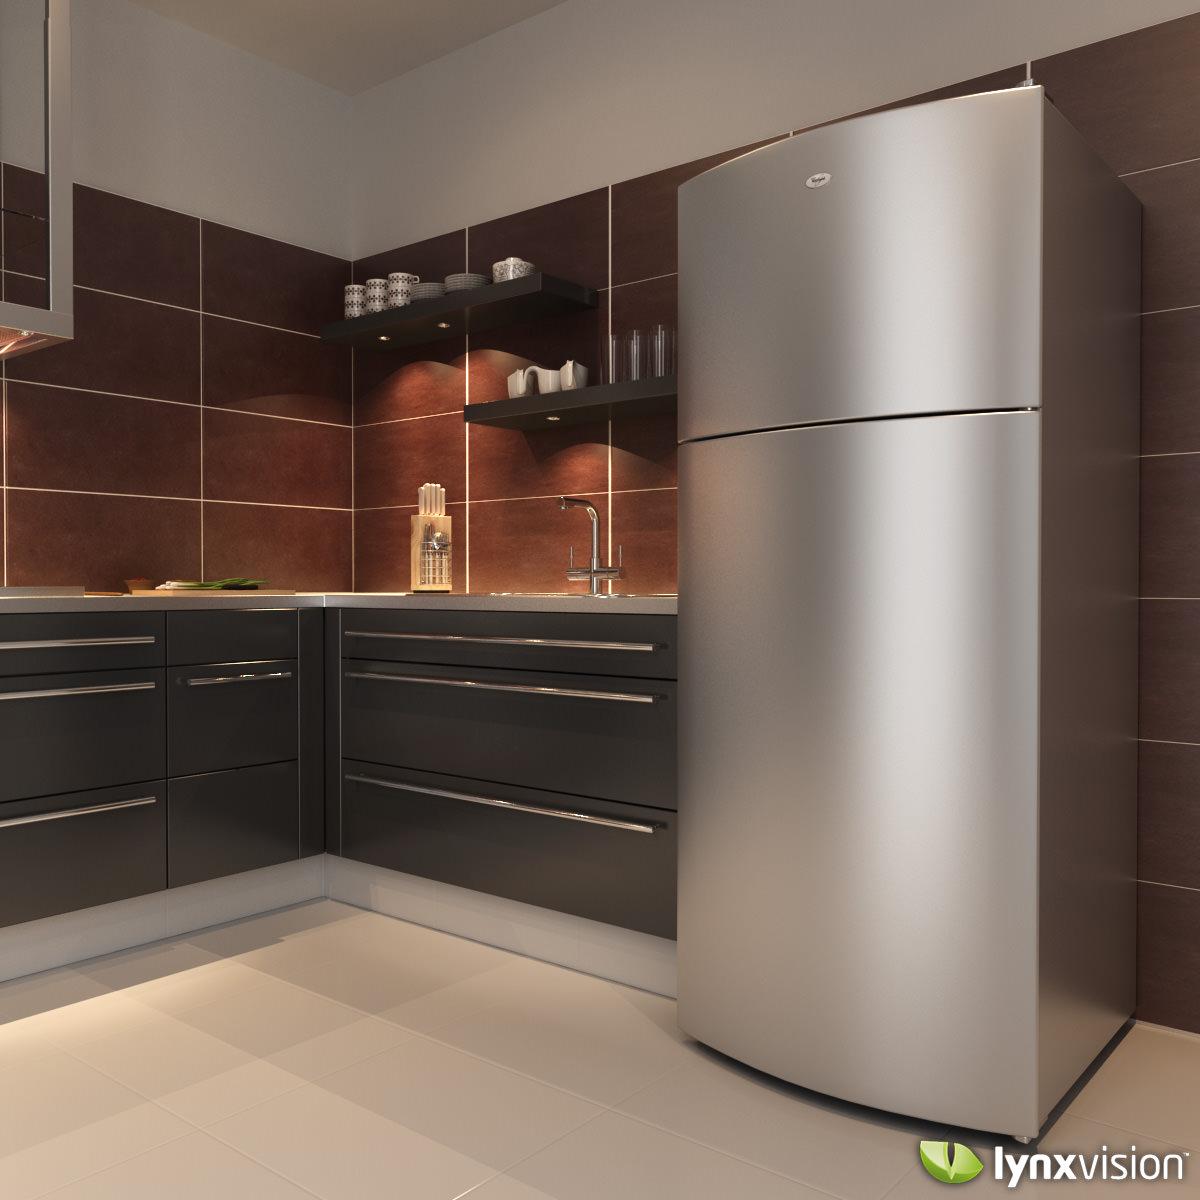 Whirlpool Top Freezer Refrigerator Whirlpool Top Freezer Refrigerator 3D Model .max .obj .fbx ...